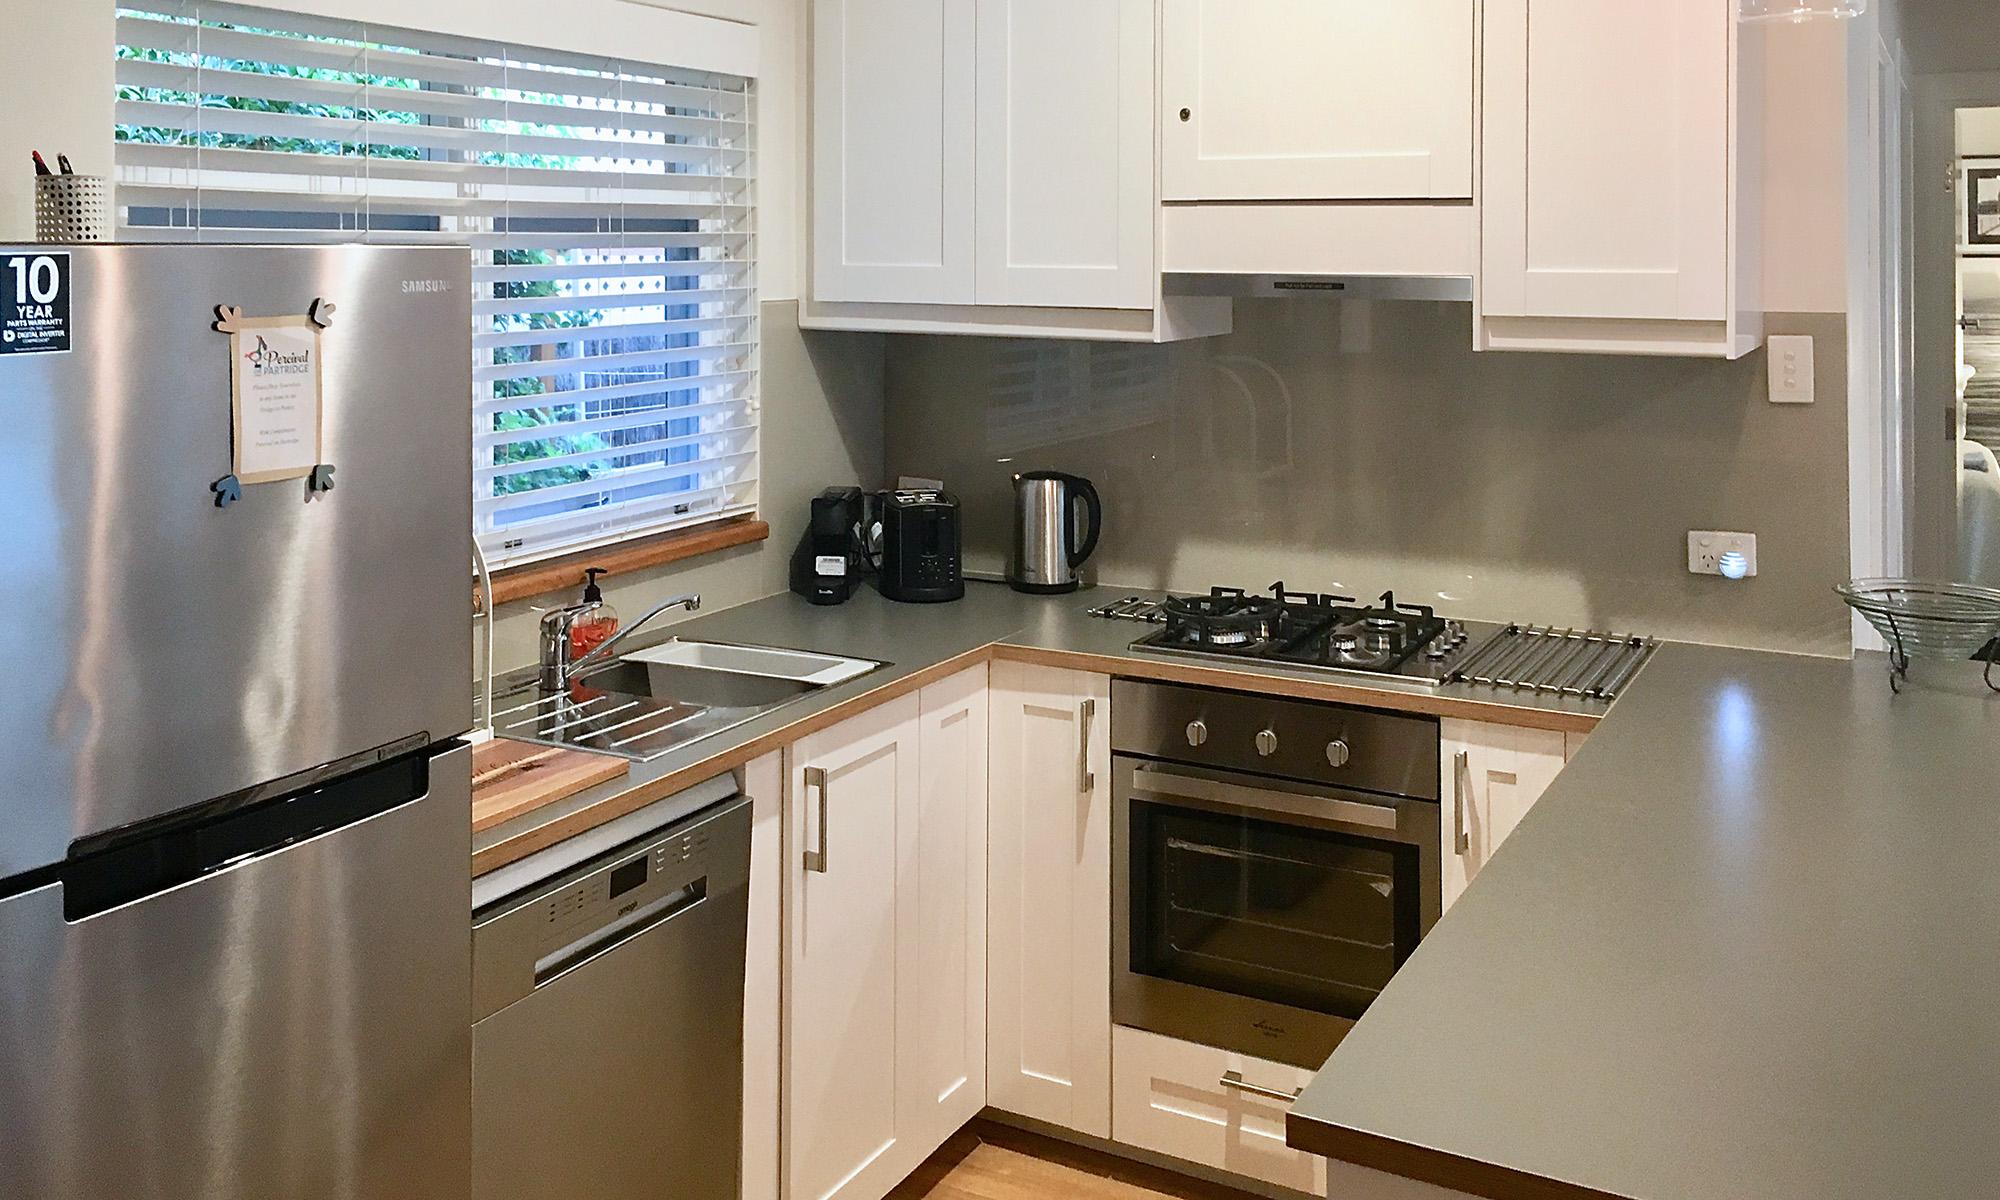 Adelaide beach holiday accommodation kitchen